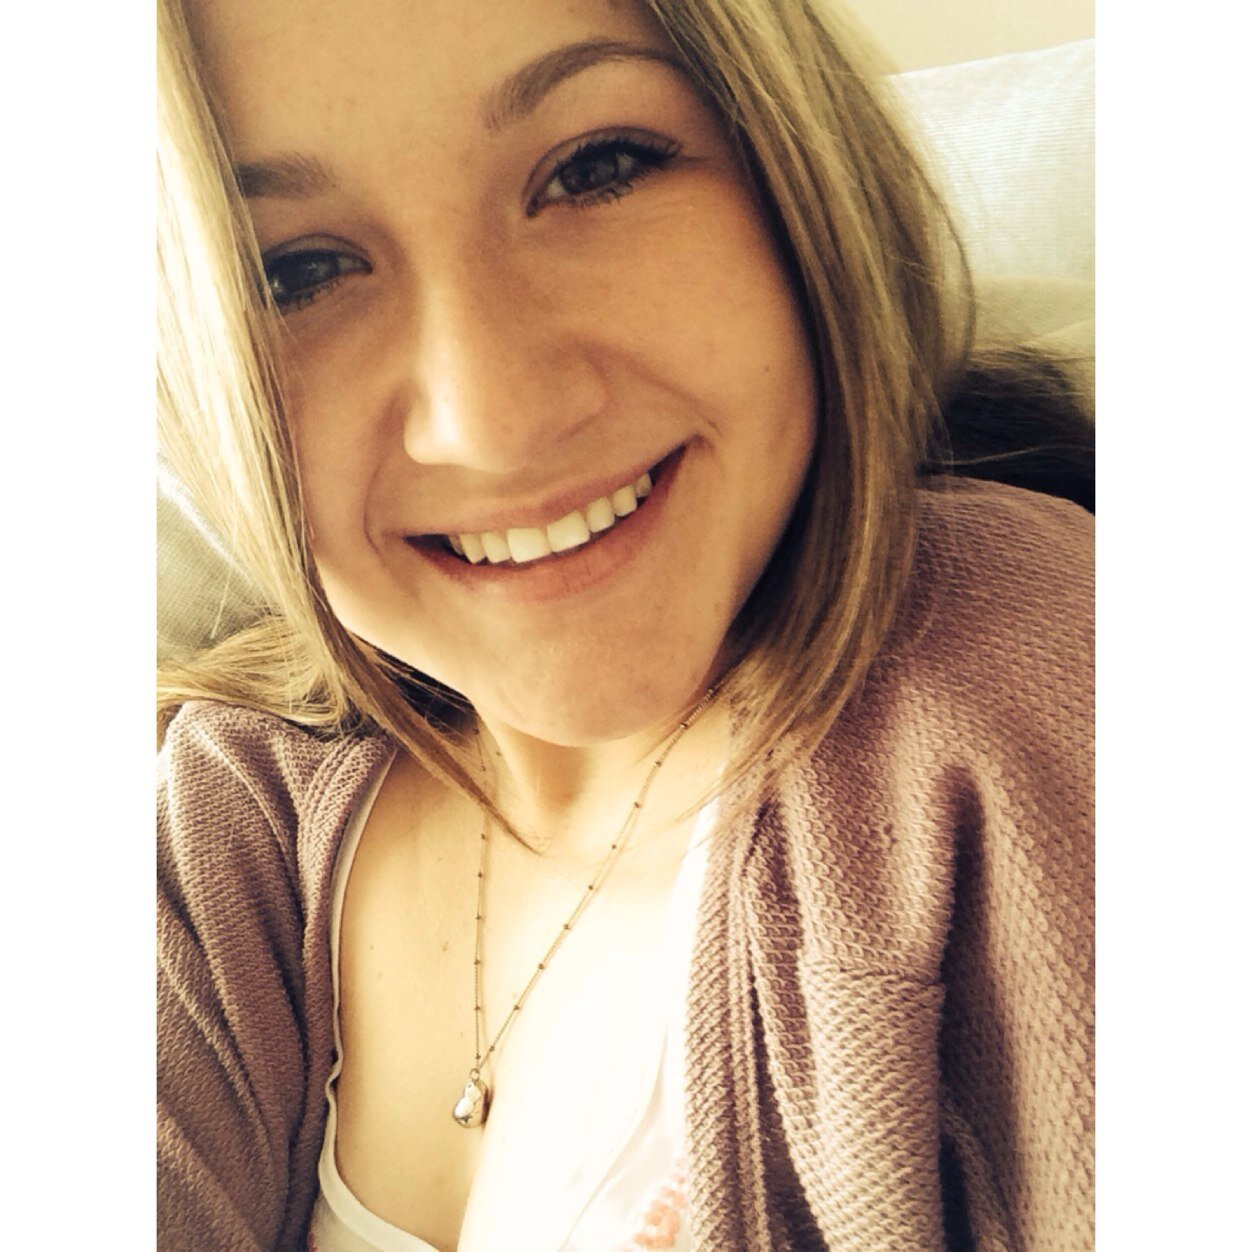 Samantha Kelly Net Worth